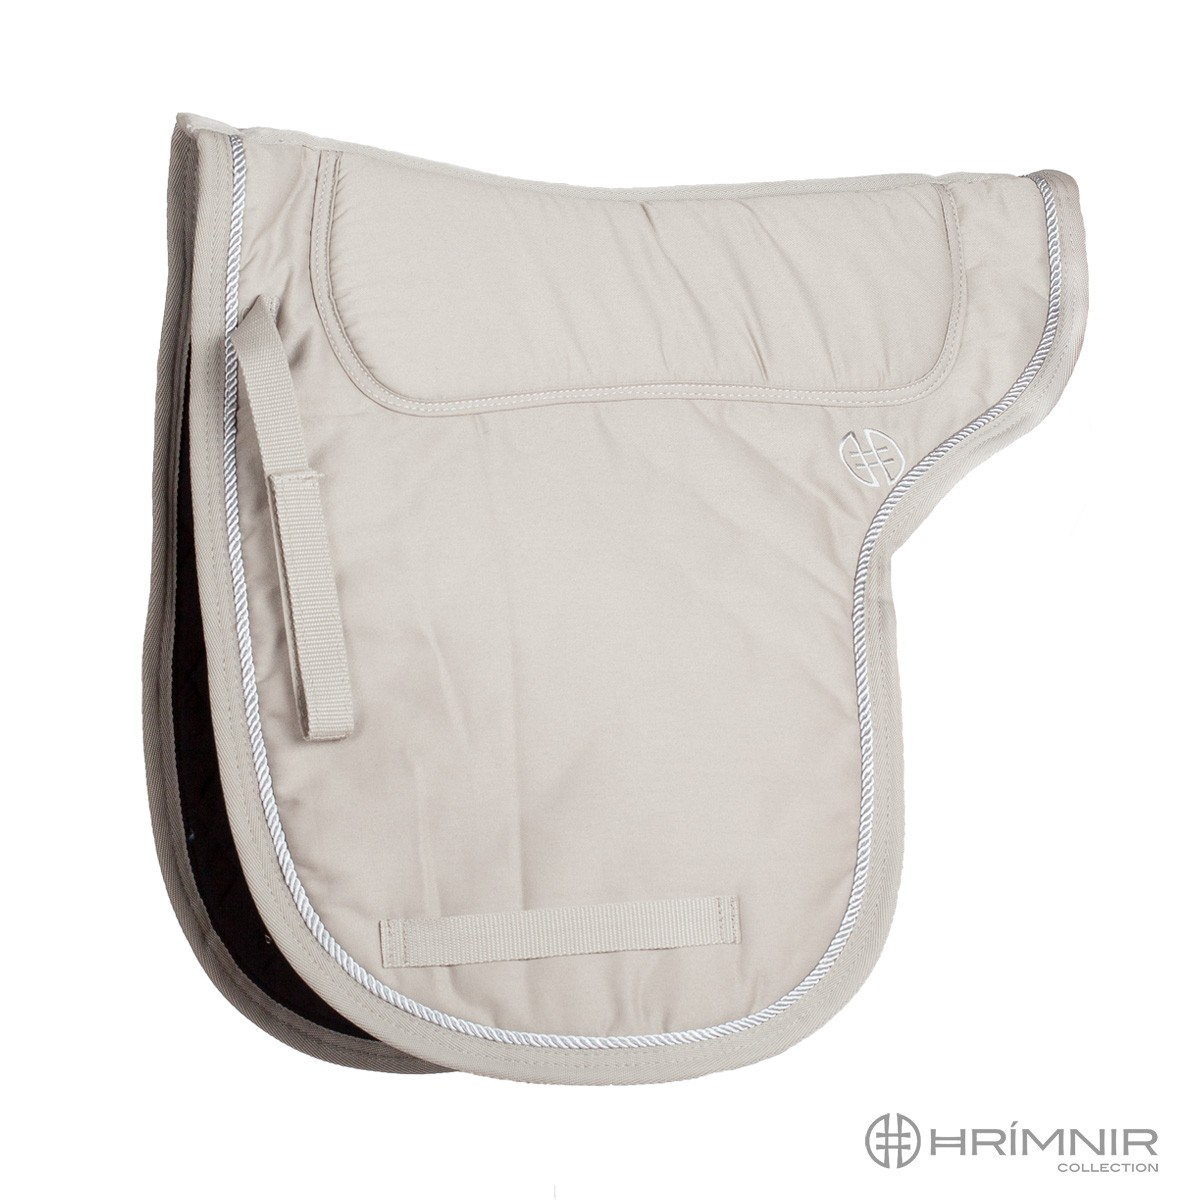 HRIMNIR relief pad2